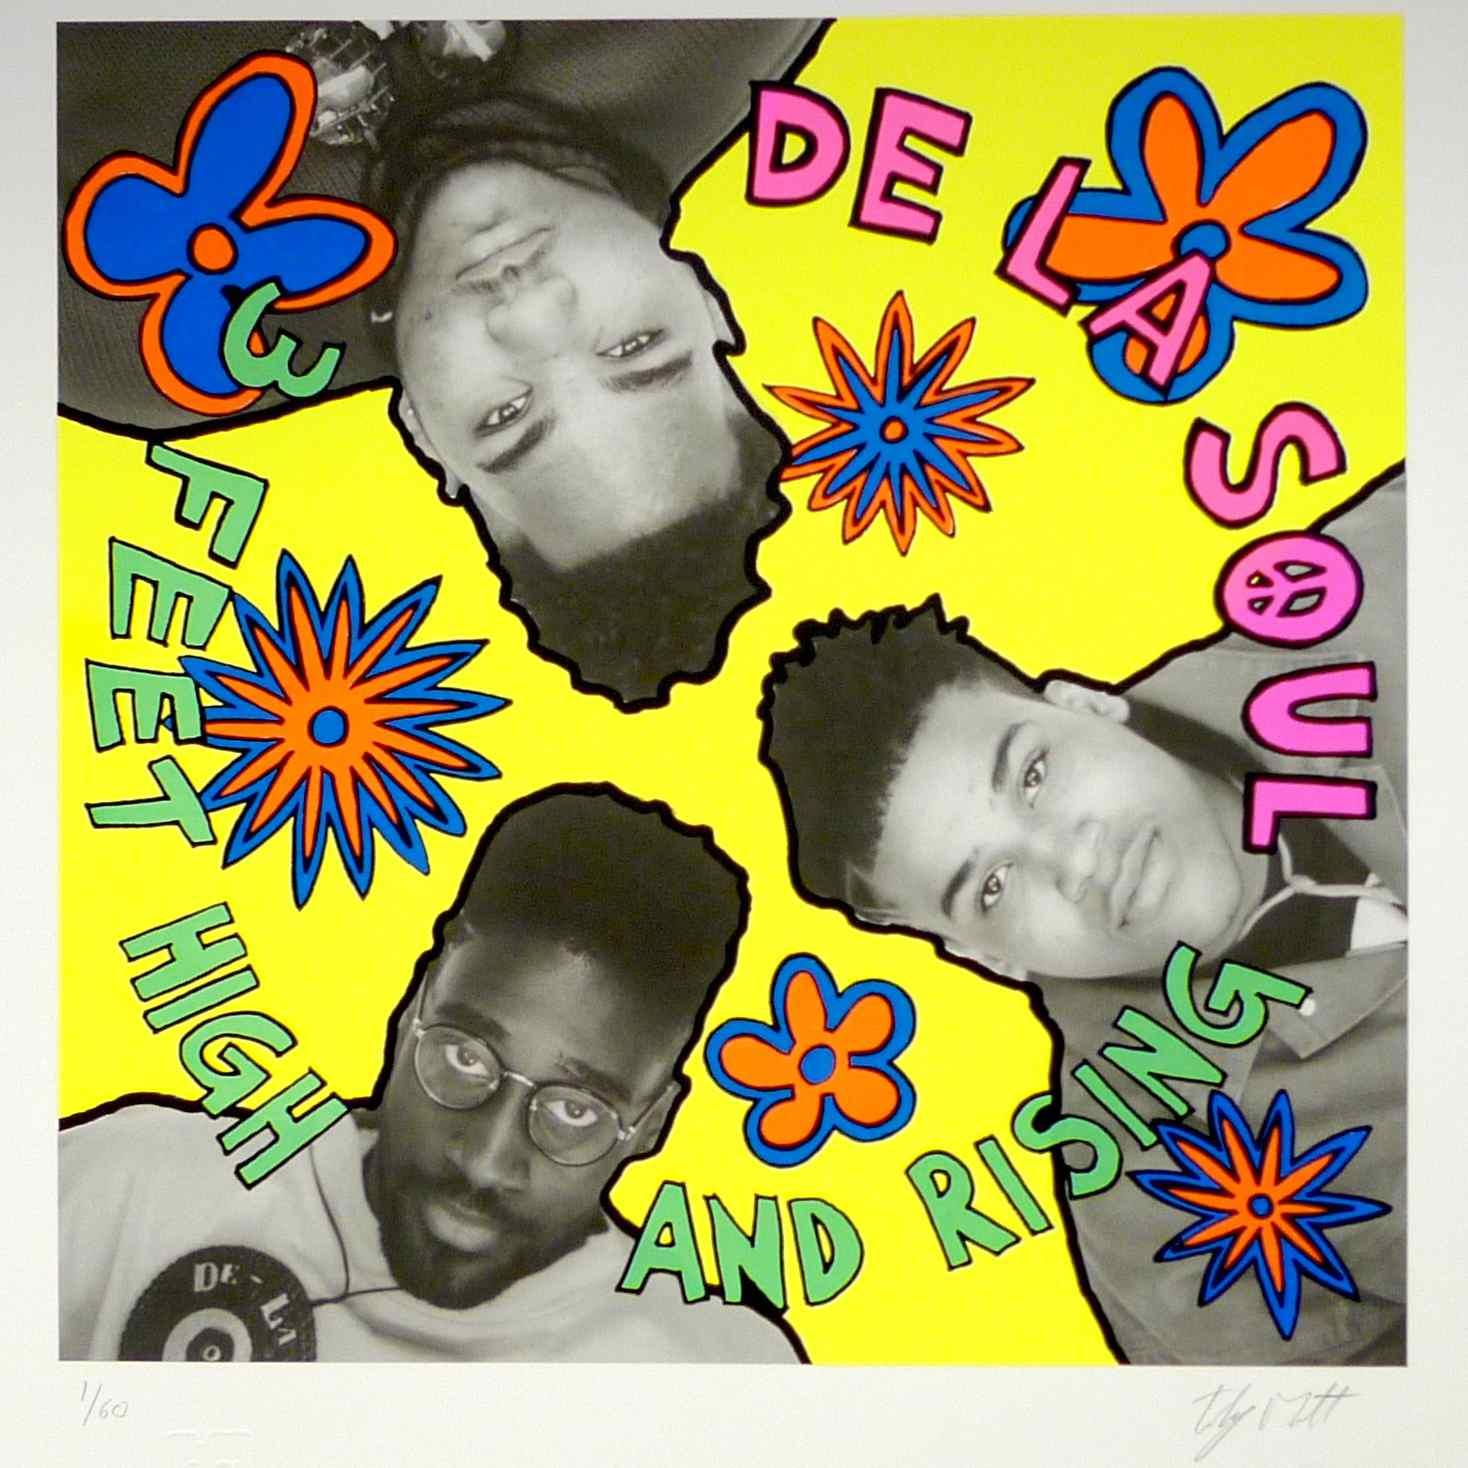 Giclée print of original album art work of De La Soul's 3 Feet High and Rising, designed by Toby Mott.